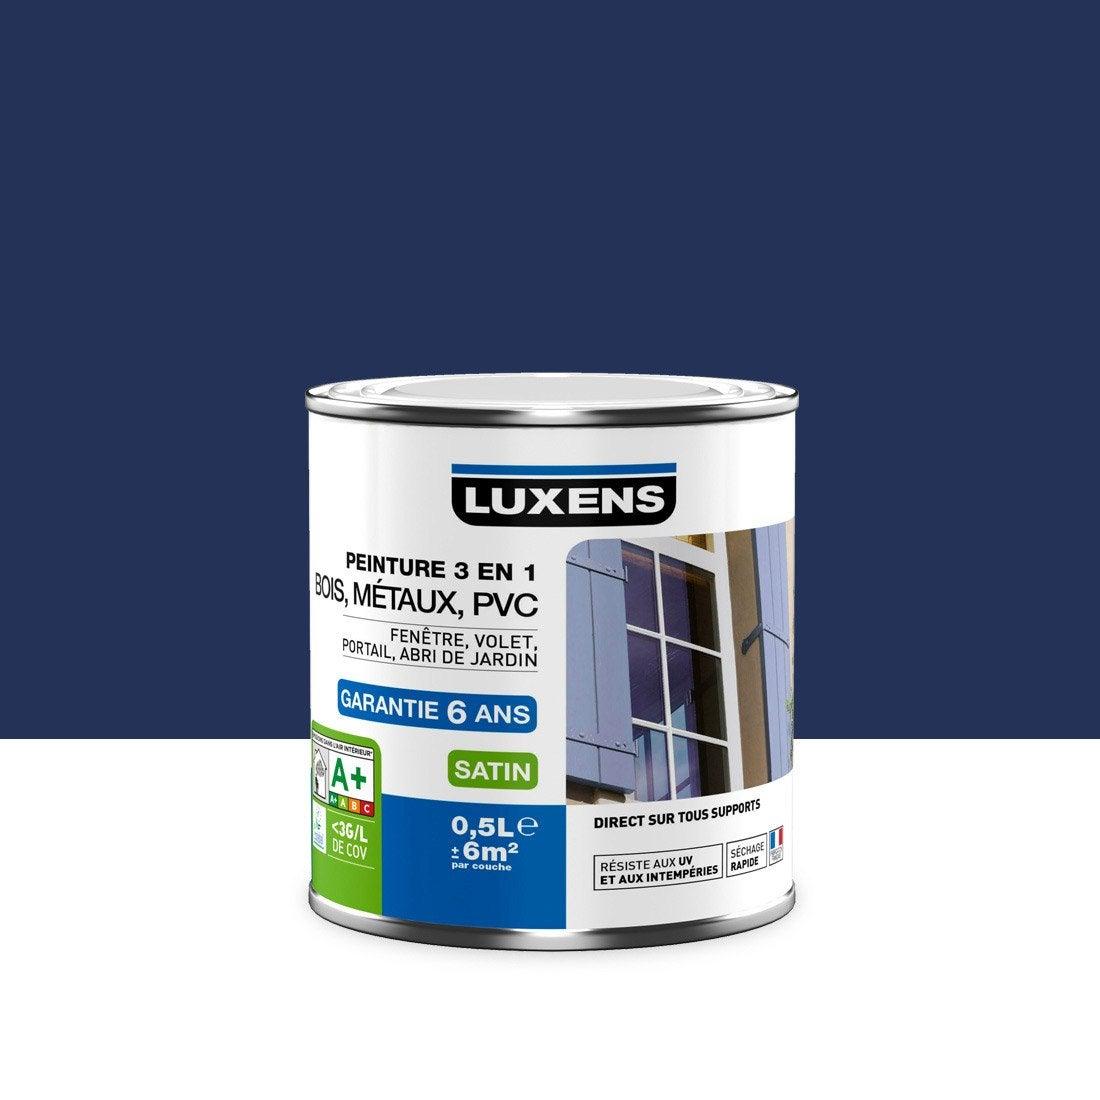 peinture multimat riau ext rieur 3 en 1 luxens bleu bleu n 1 0 5 l leroy merlin. Black Bedroom Furniture Sets. Home Design Ideas